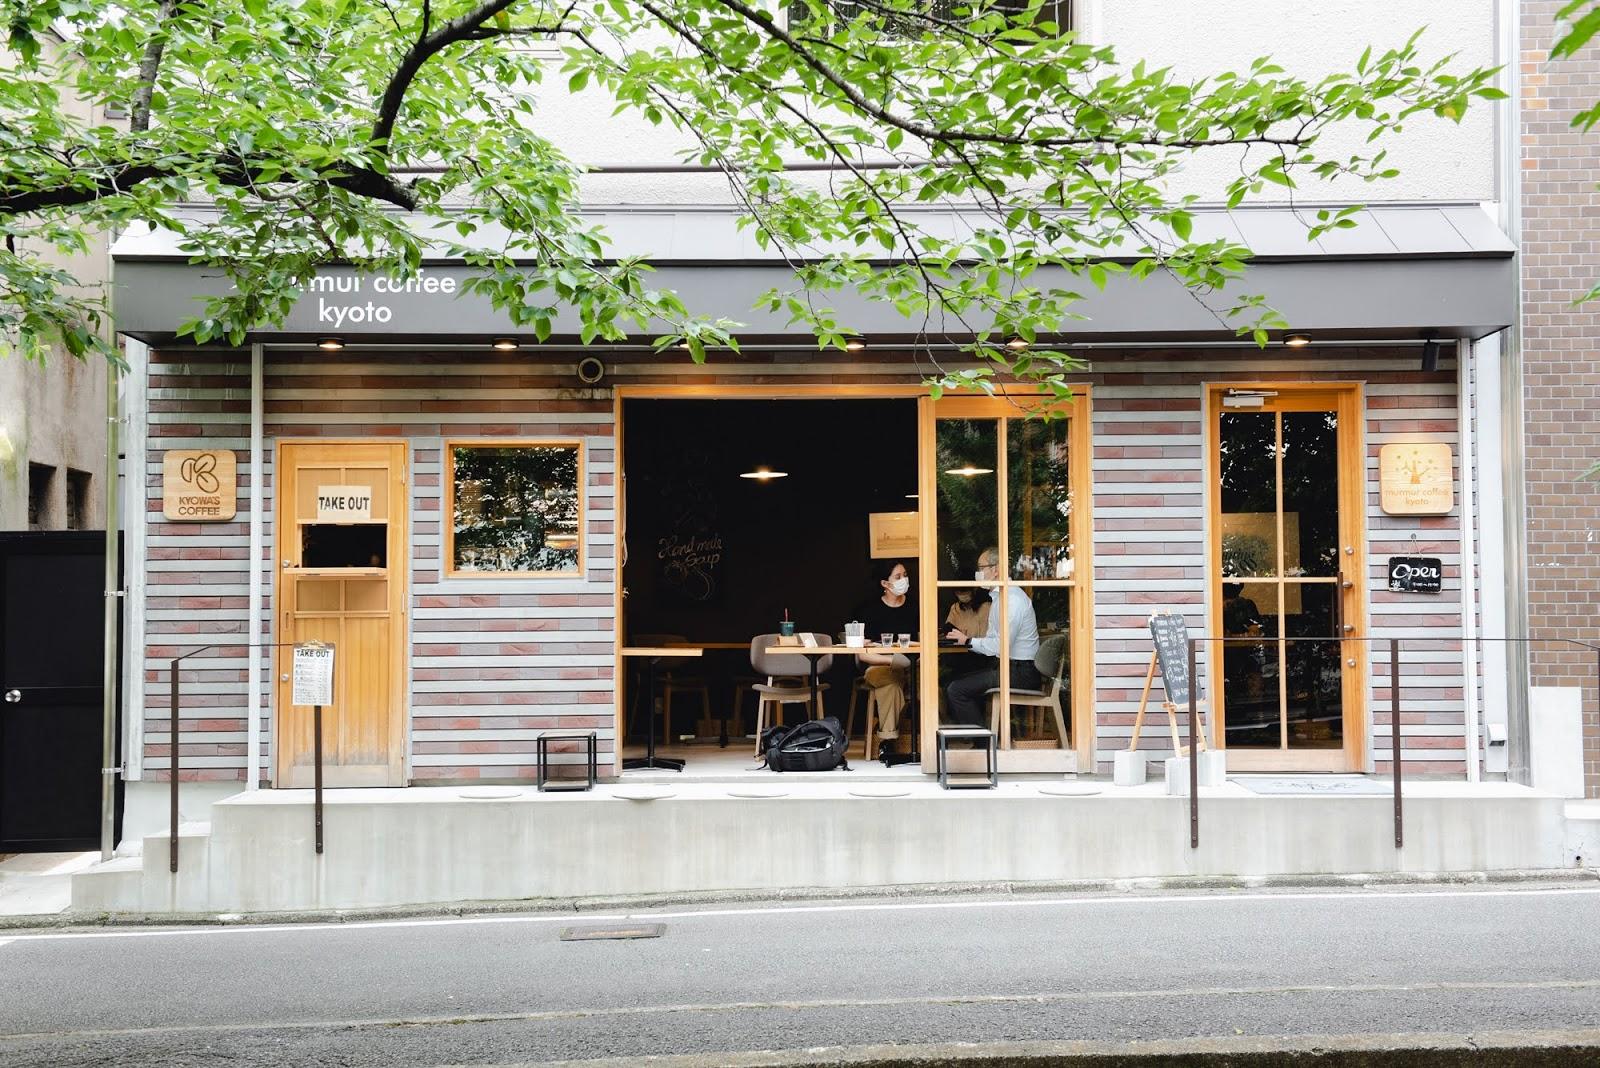 murmur coffee kyoto